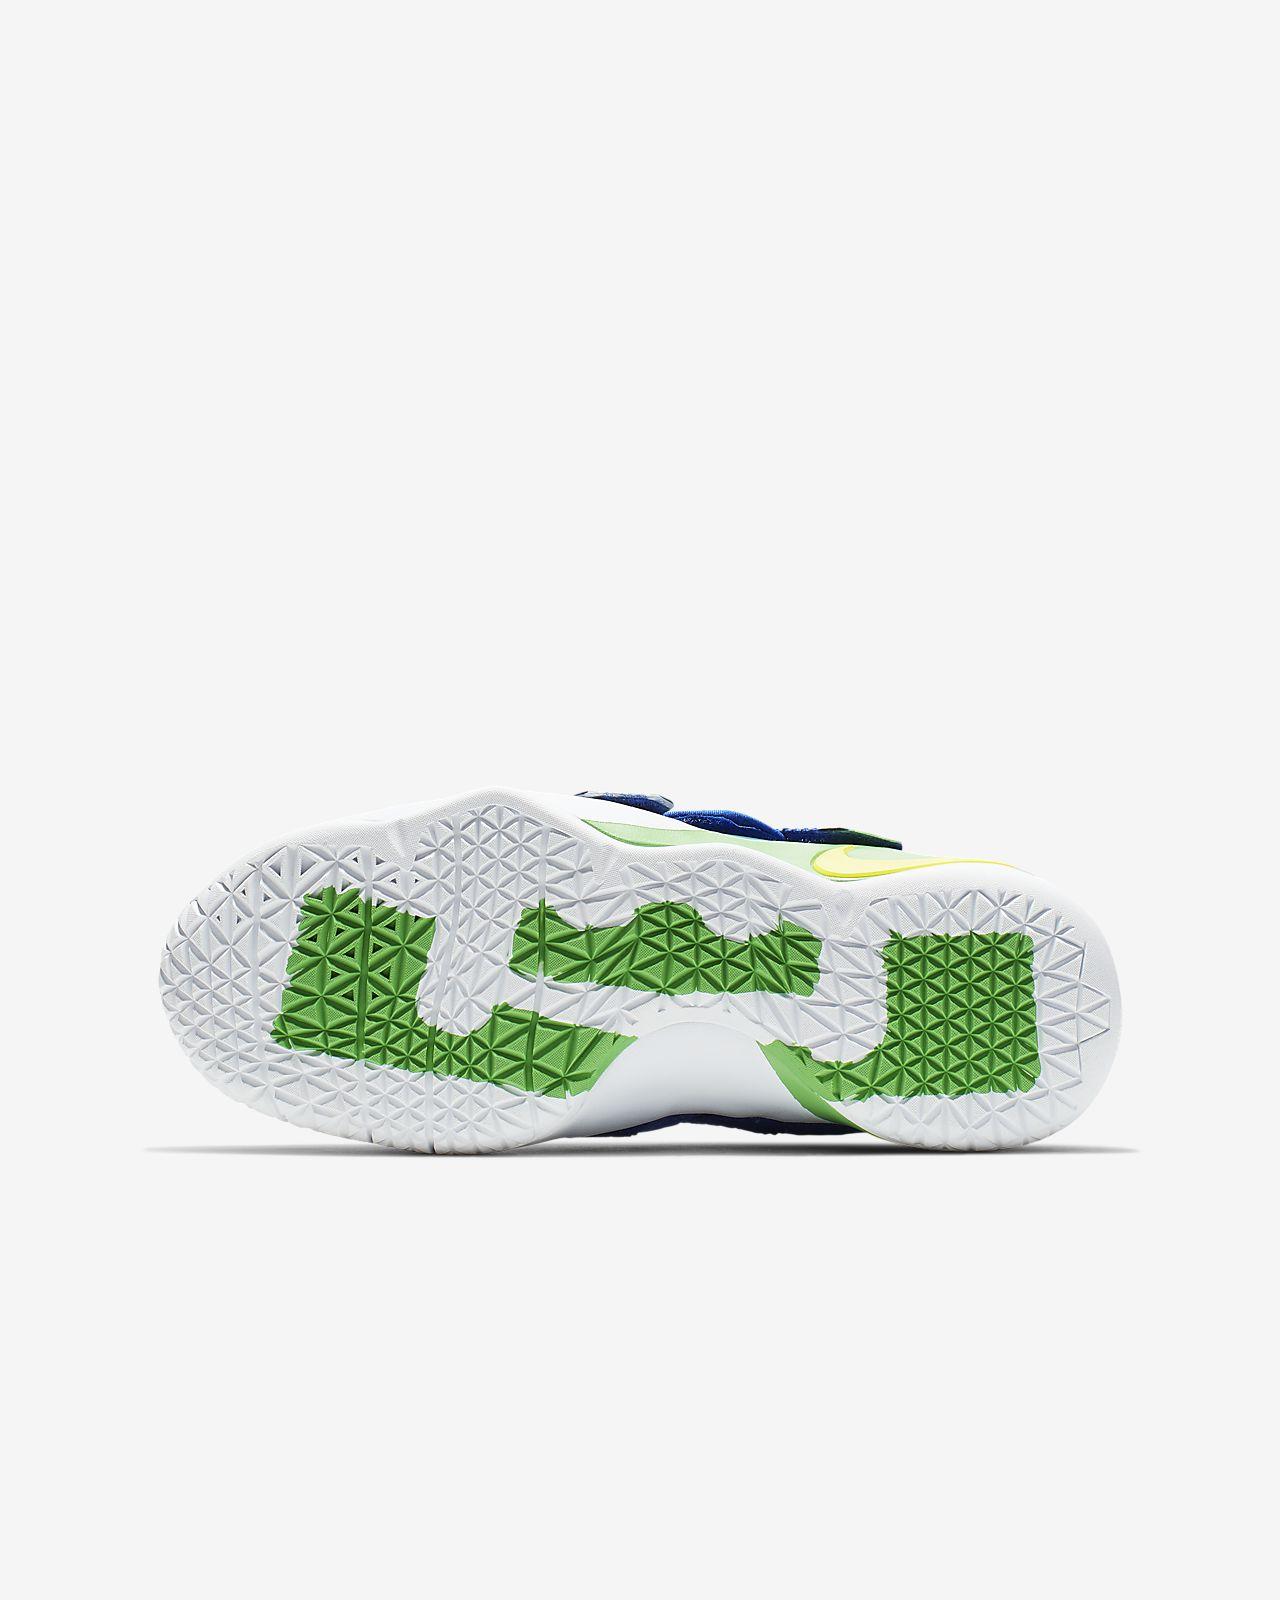 best service 39298 12519 LeBron Soldier 11 FlyEase Big Kids' Basketball Shoe